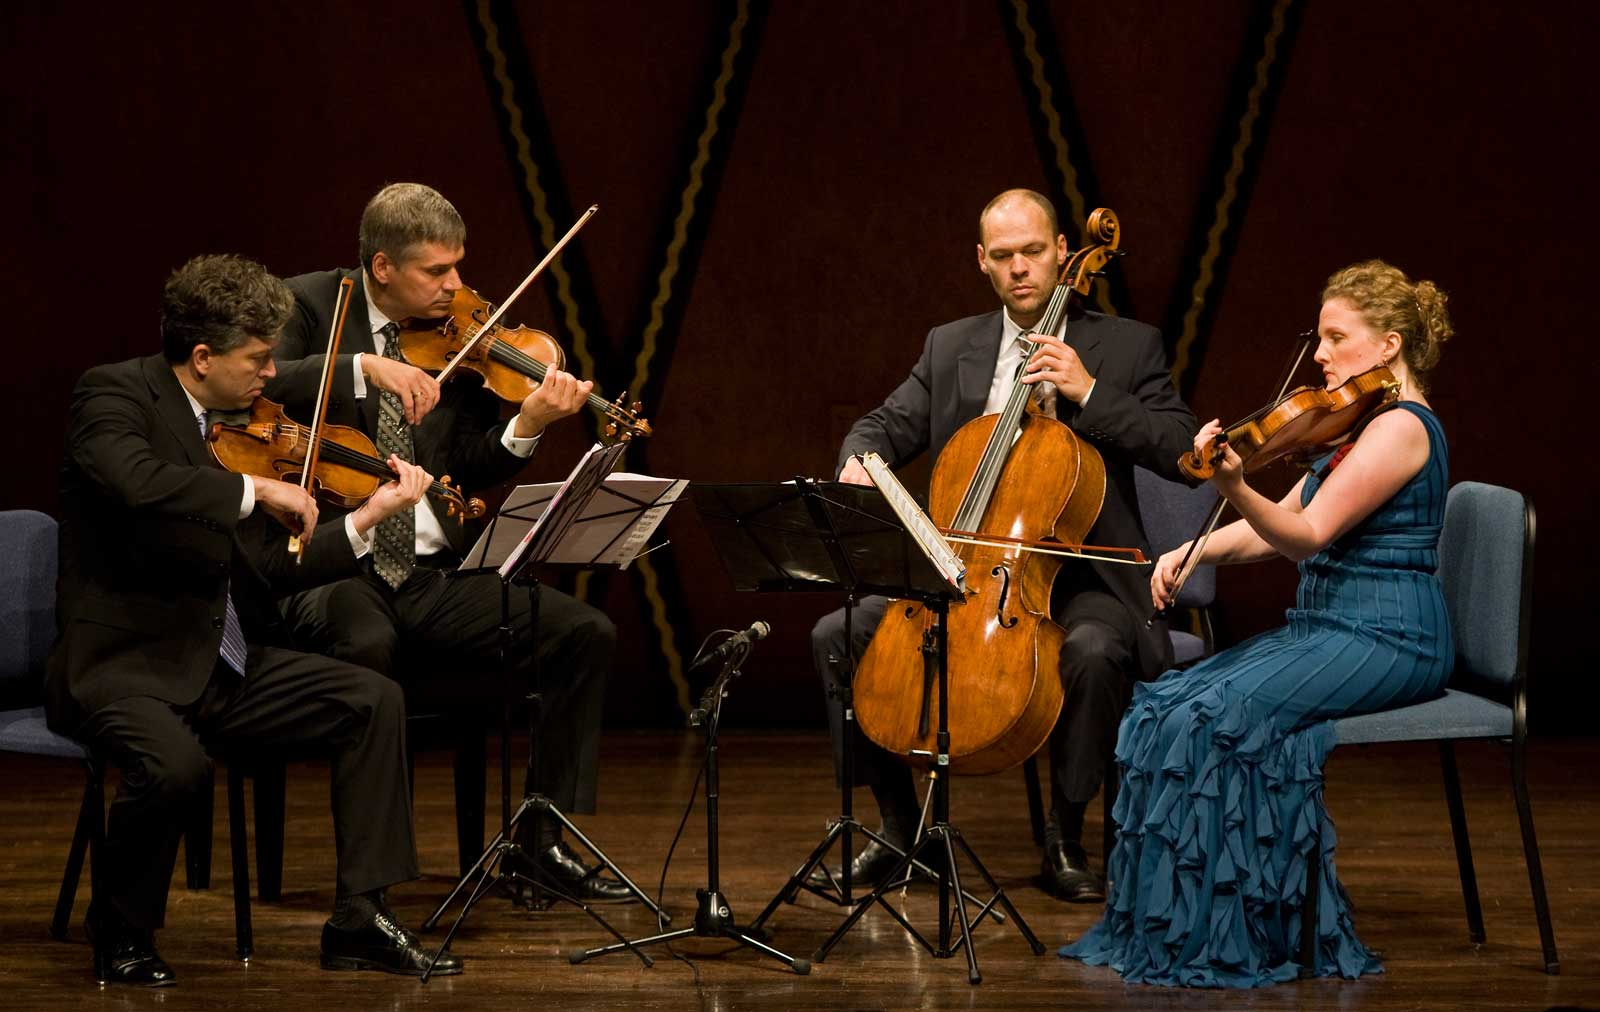 Mimir Chamber Music Festival